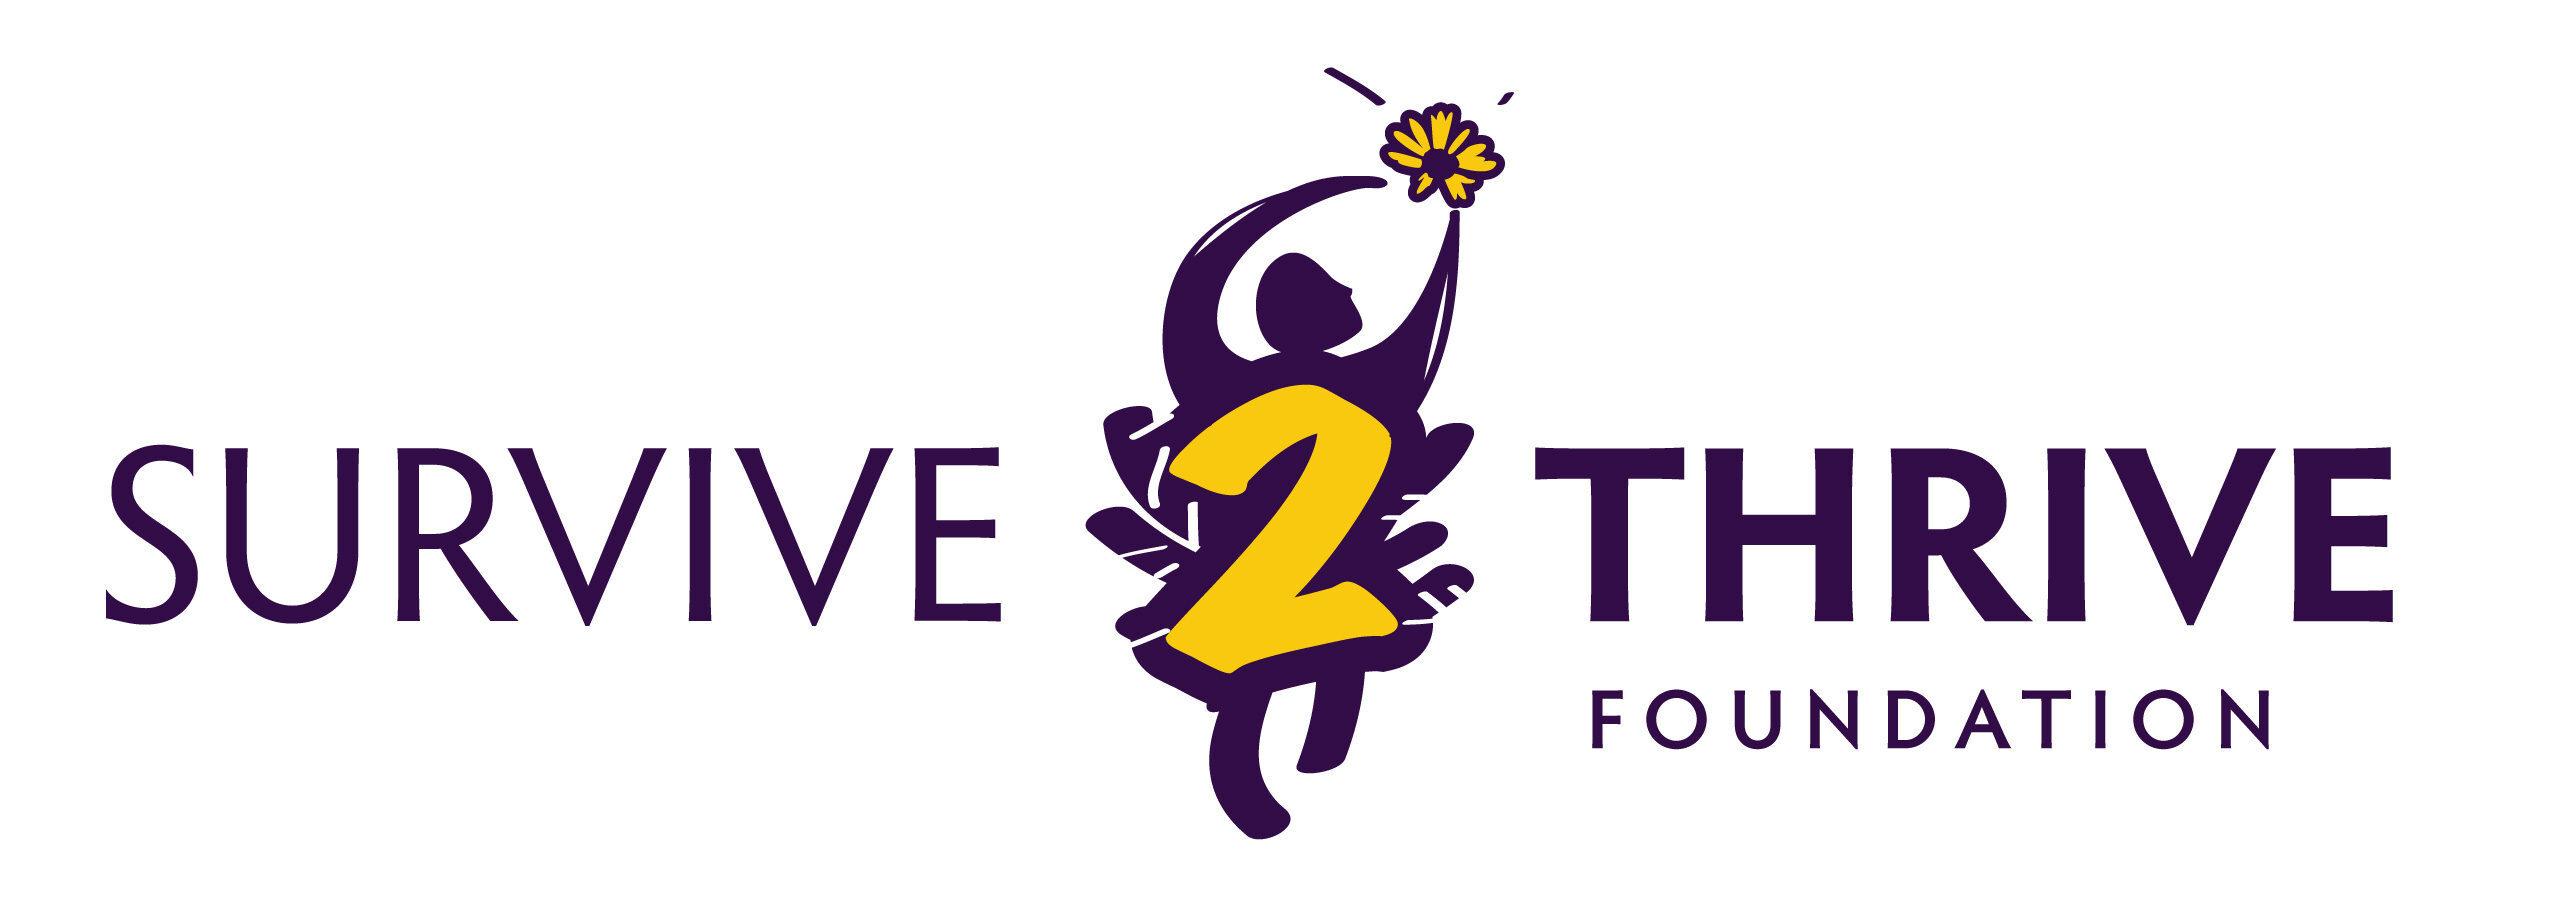 Survive2Thrive Foundation